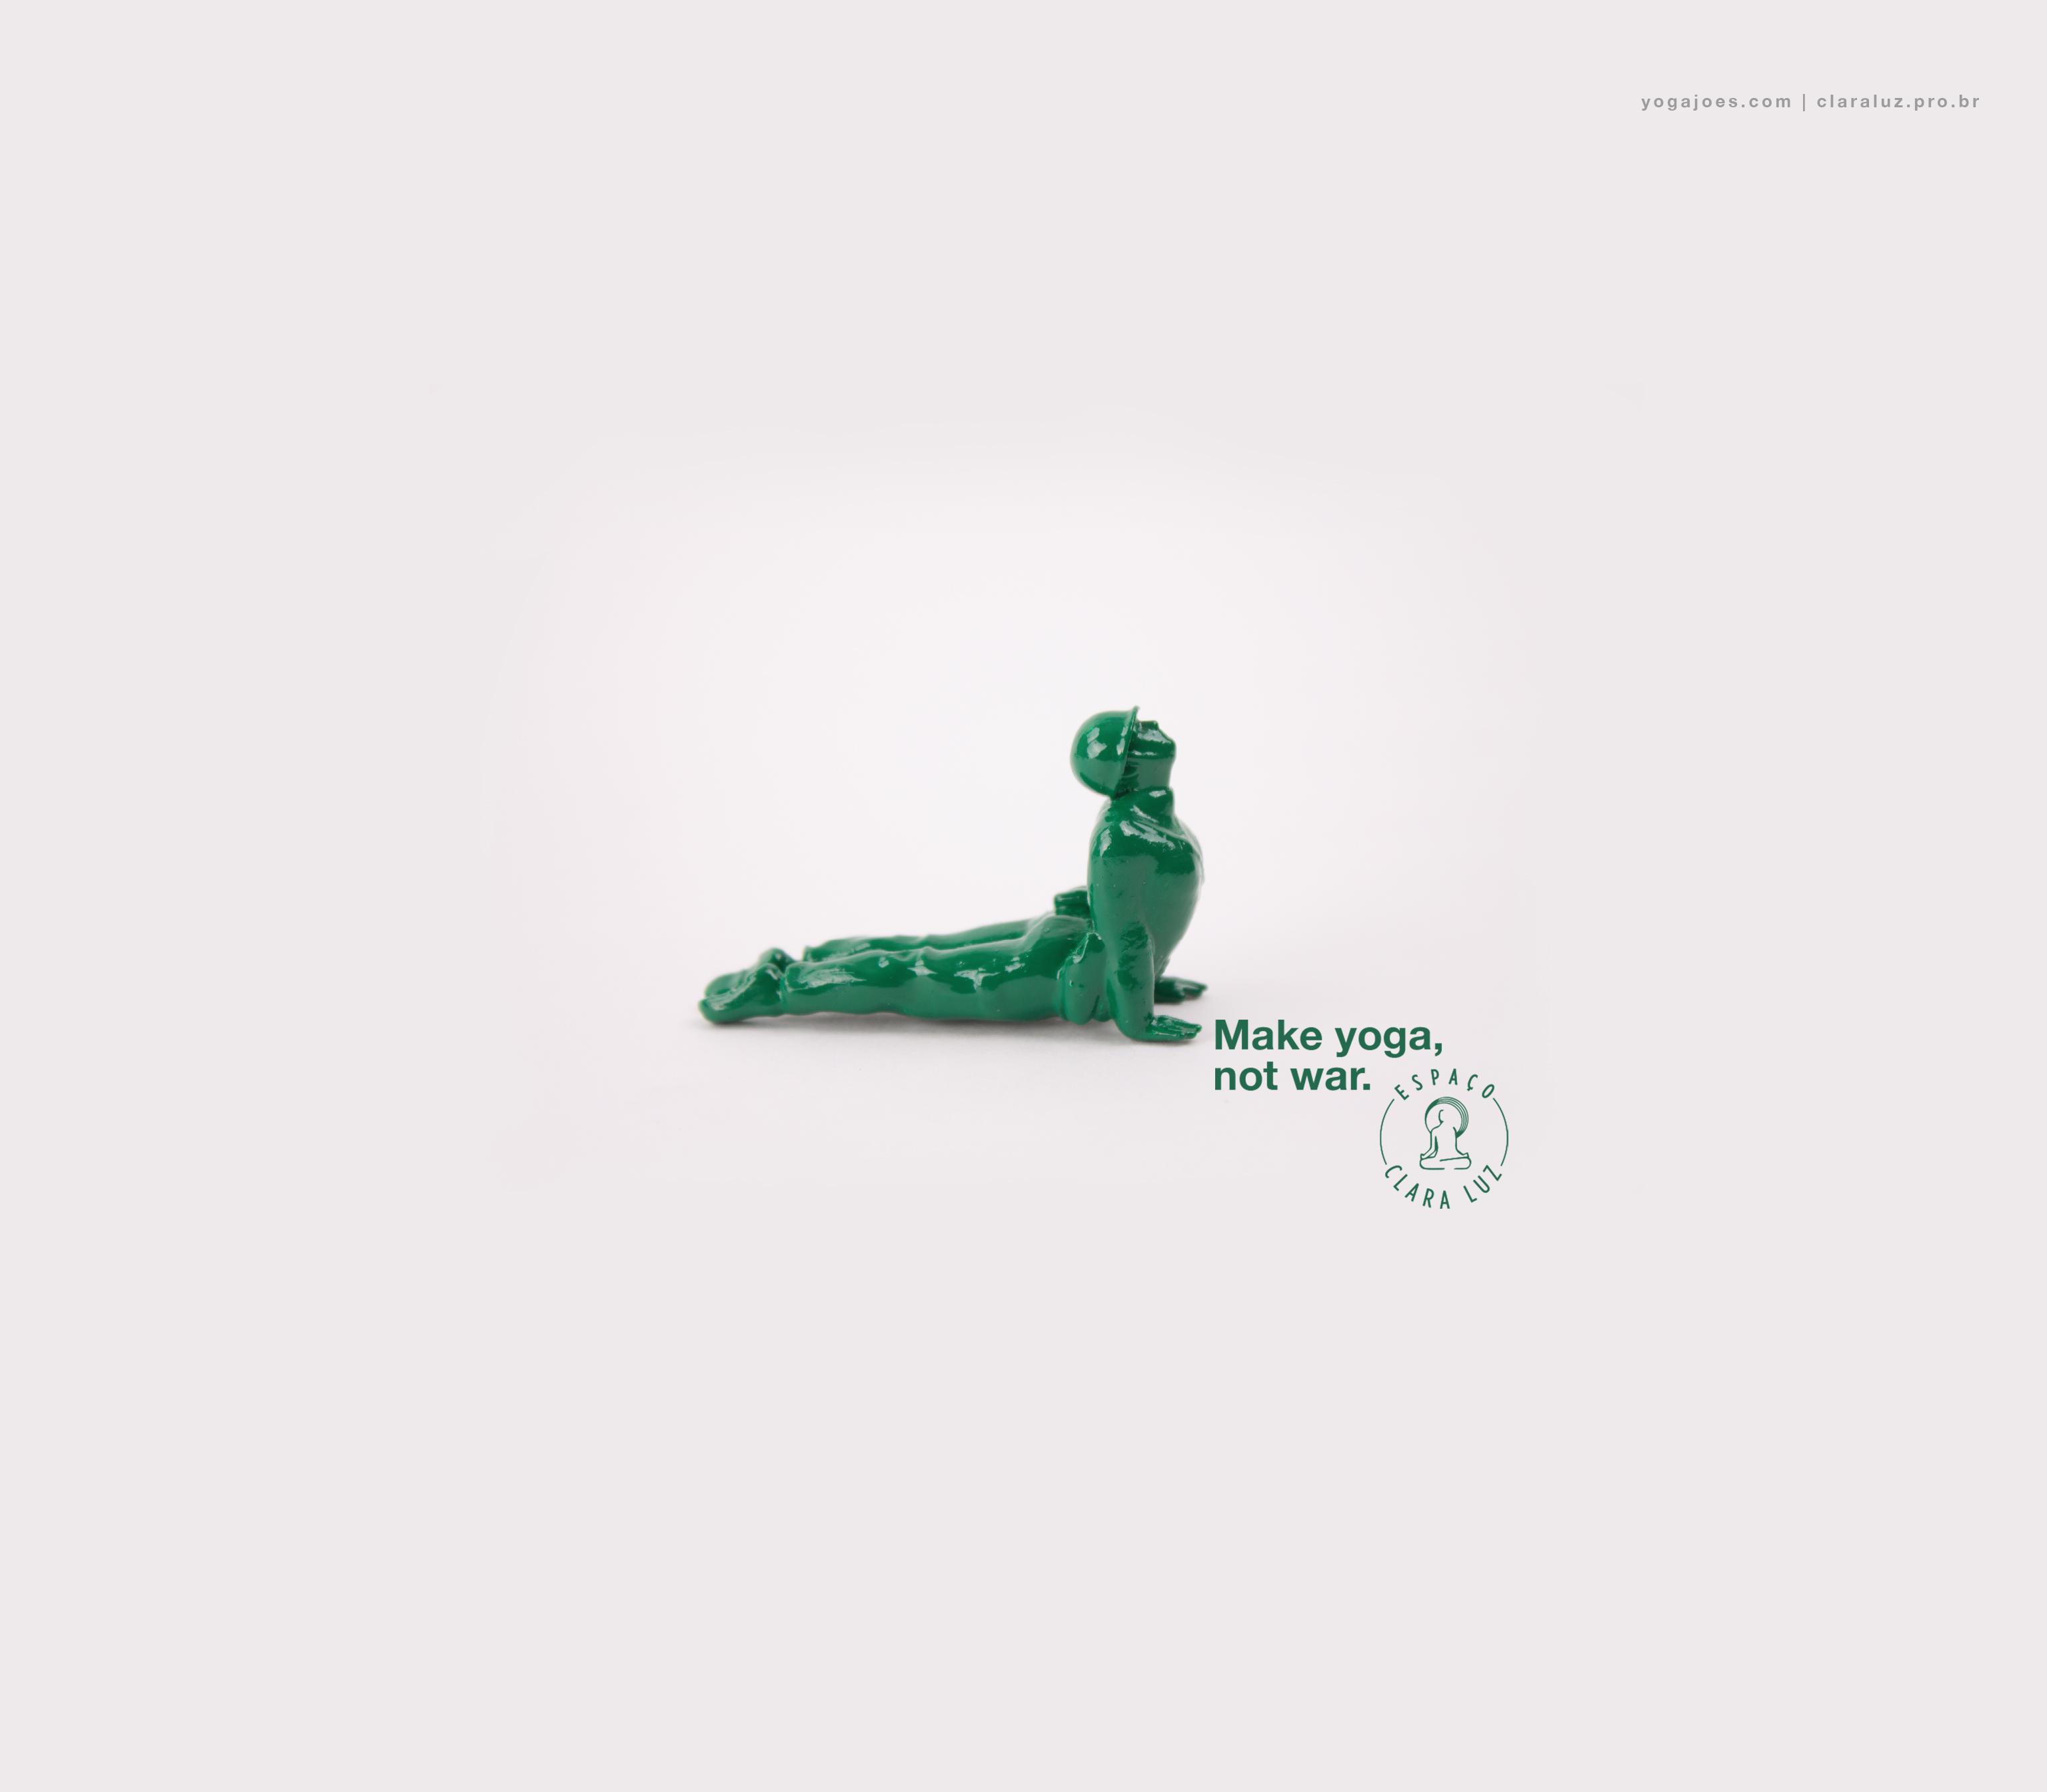 ad-insp-yoga-class-yoga-toys-print-2